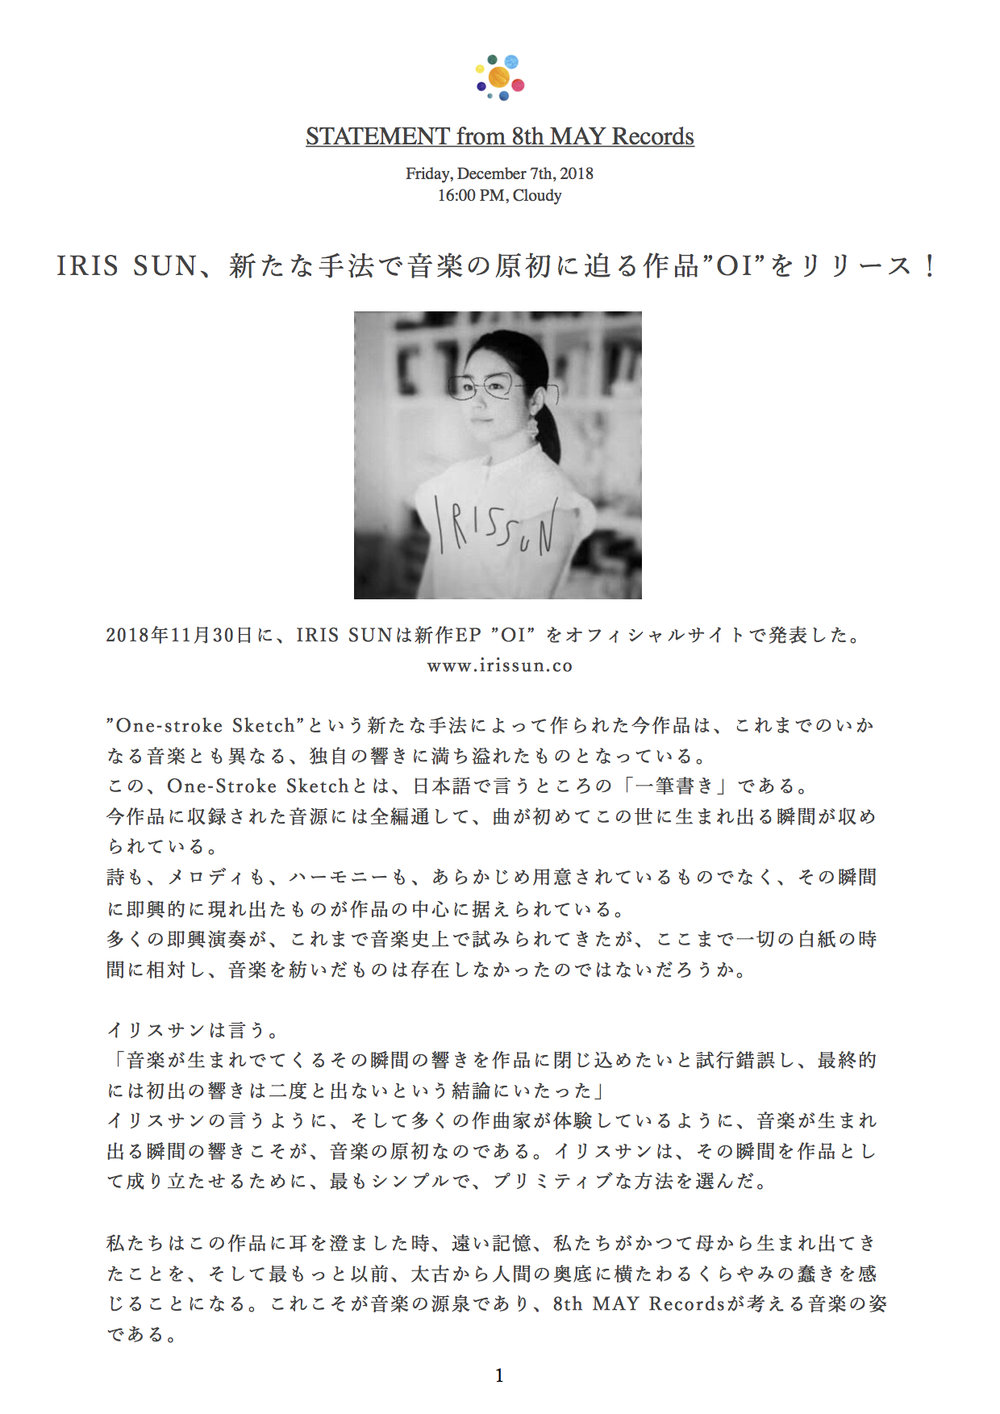 IRIS SUN _statement EP リリース_1208.jpg